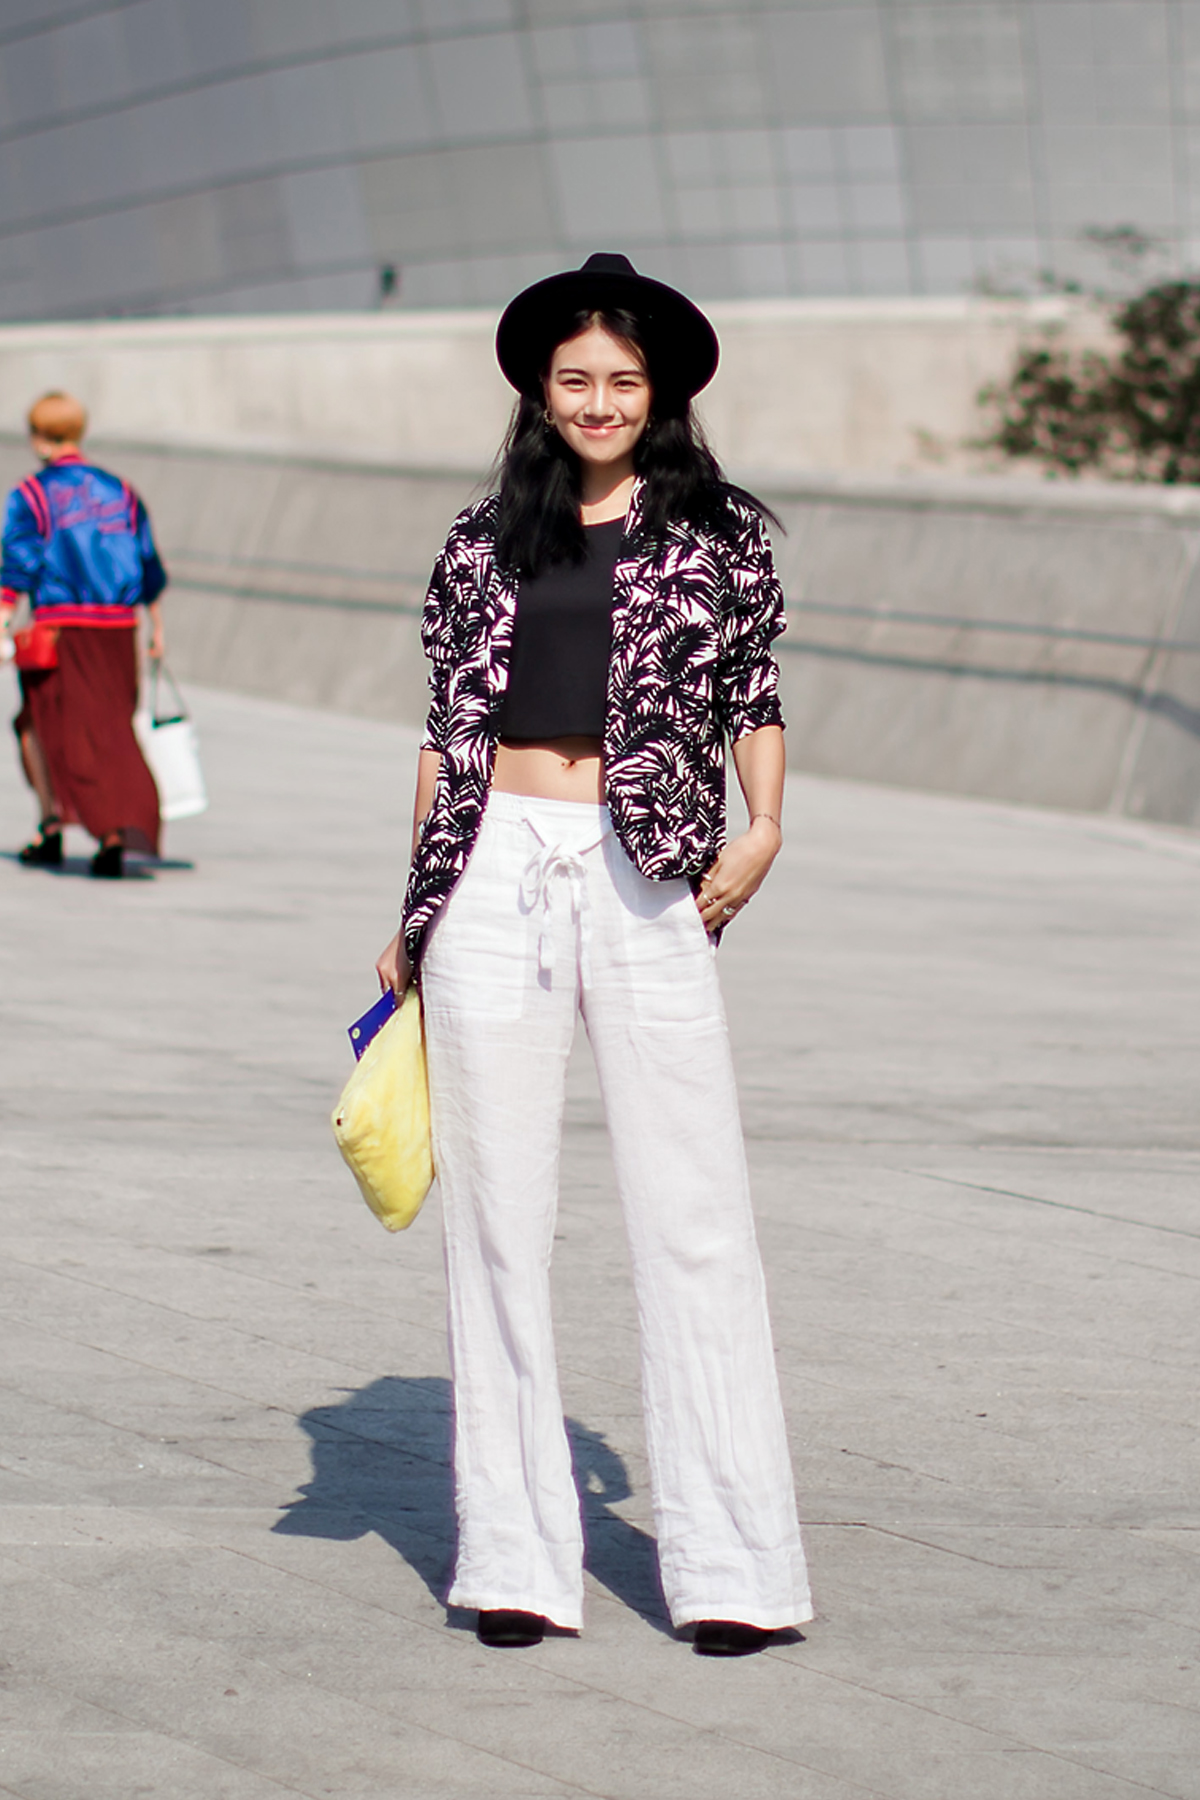 On the street… Son Hyoeun Seoul fashion week 2016 SS